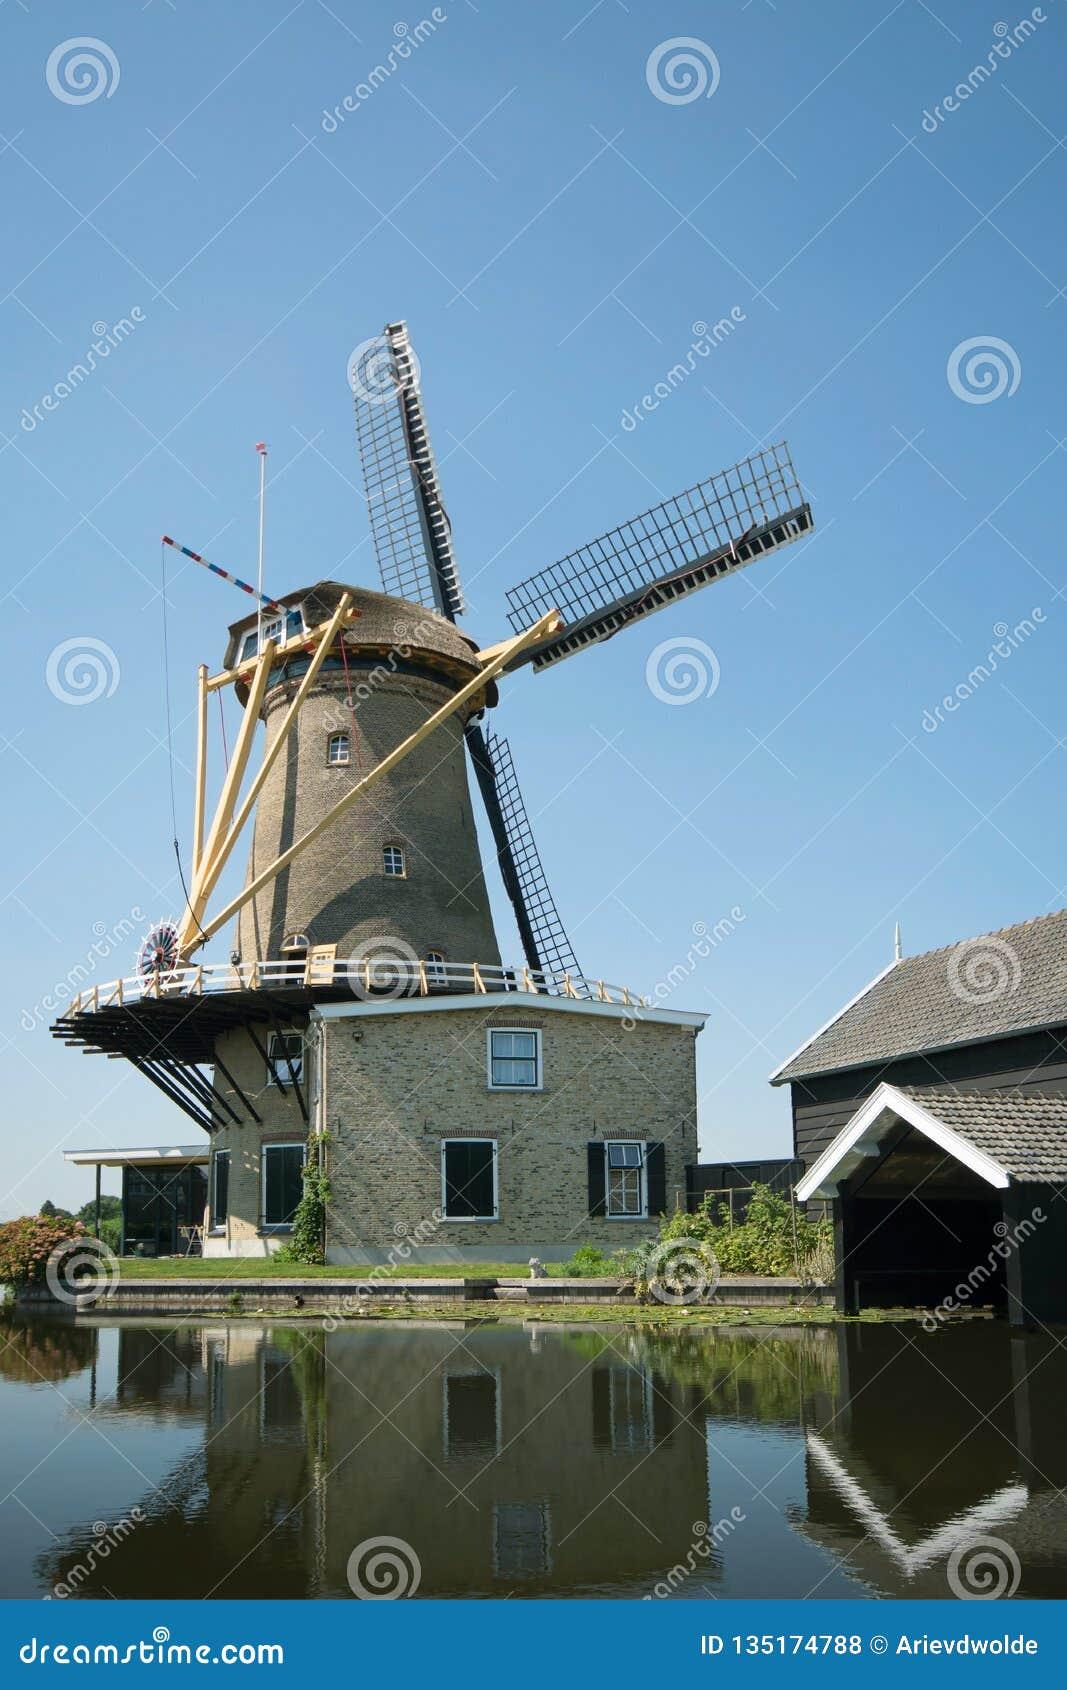 Windmolen Vriendschap in Bleskensgraaf Holland